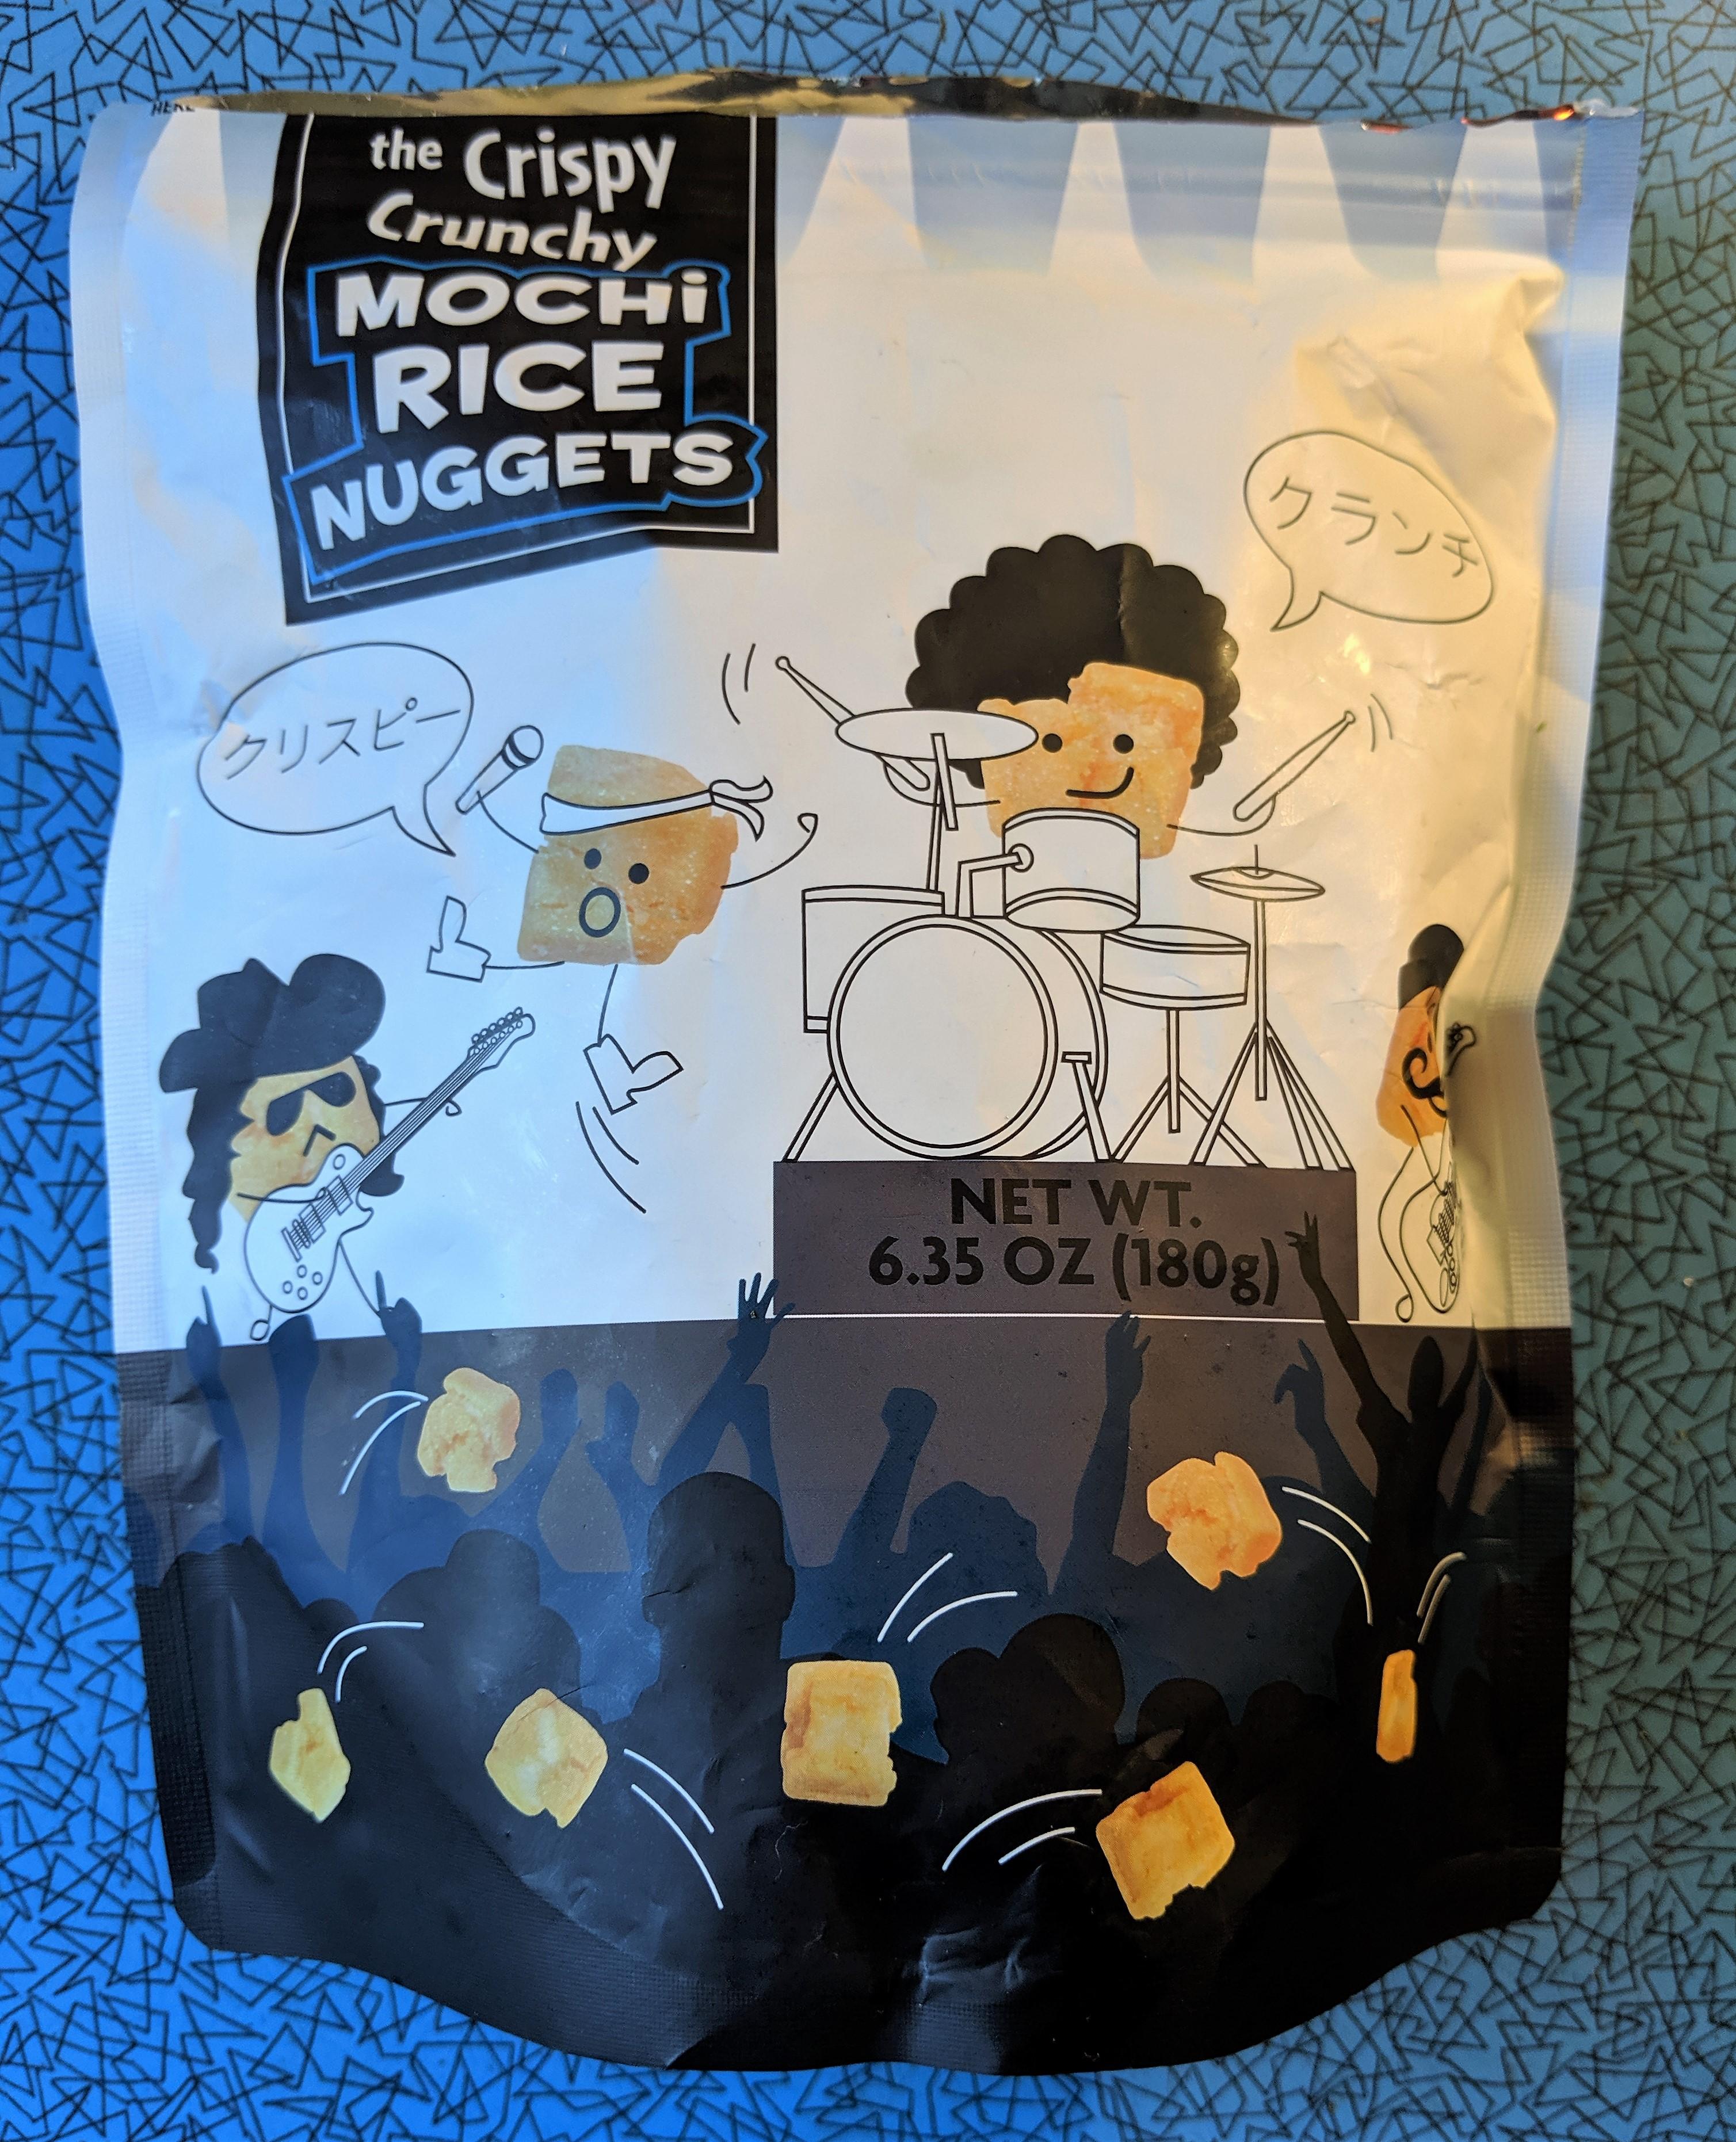 Mochi Rice Nuggets